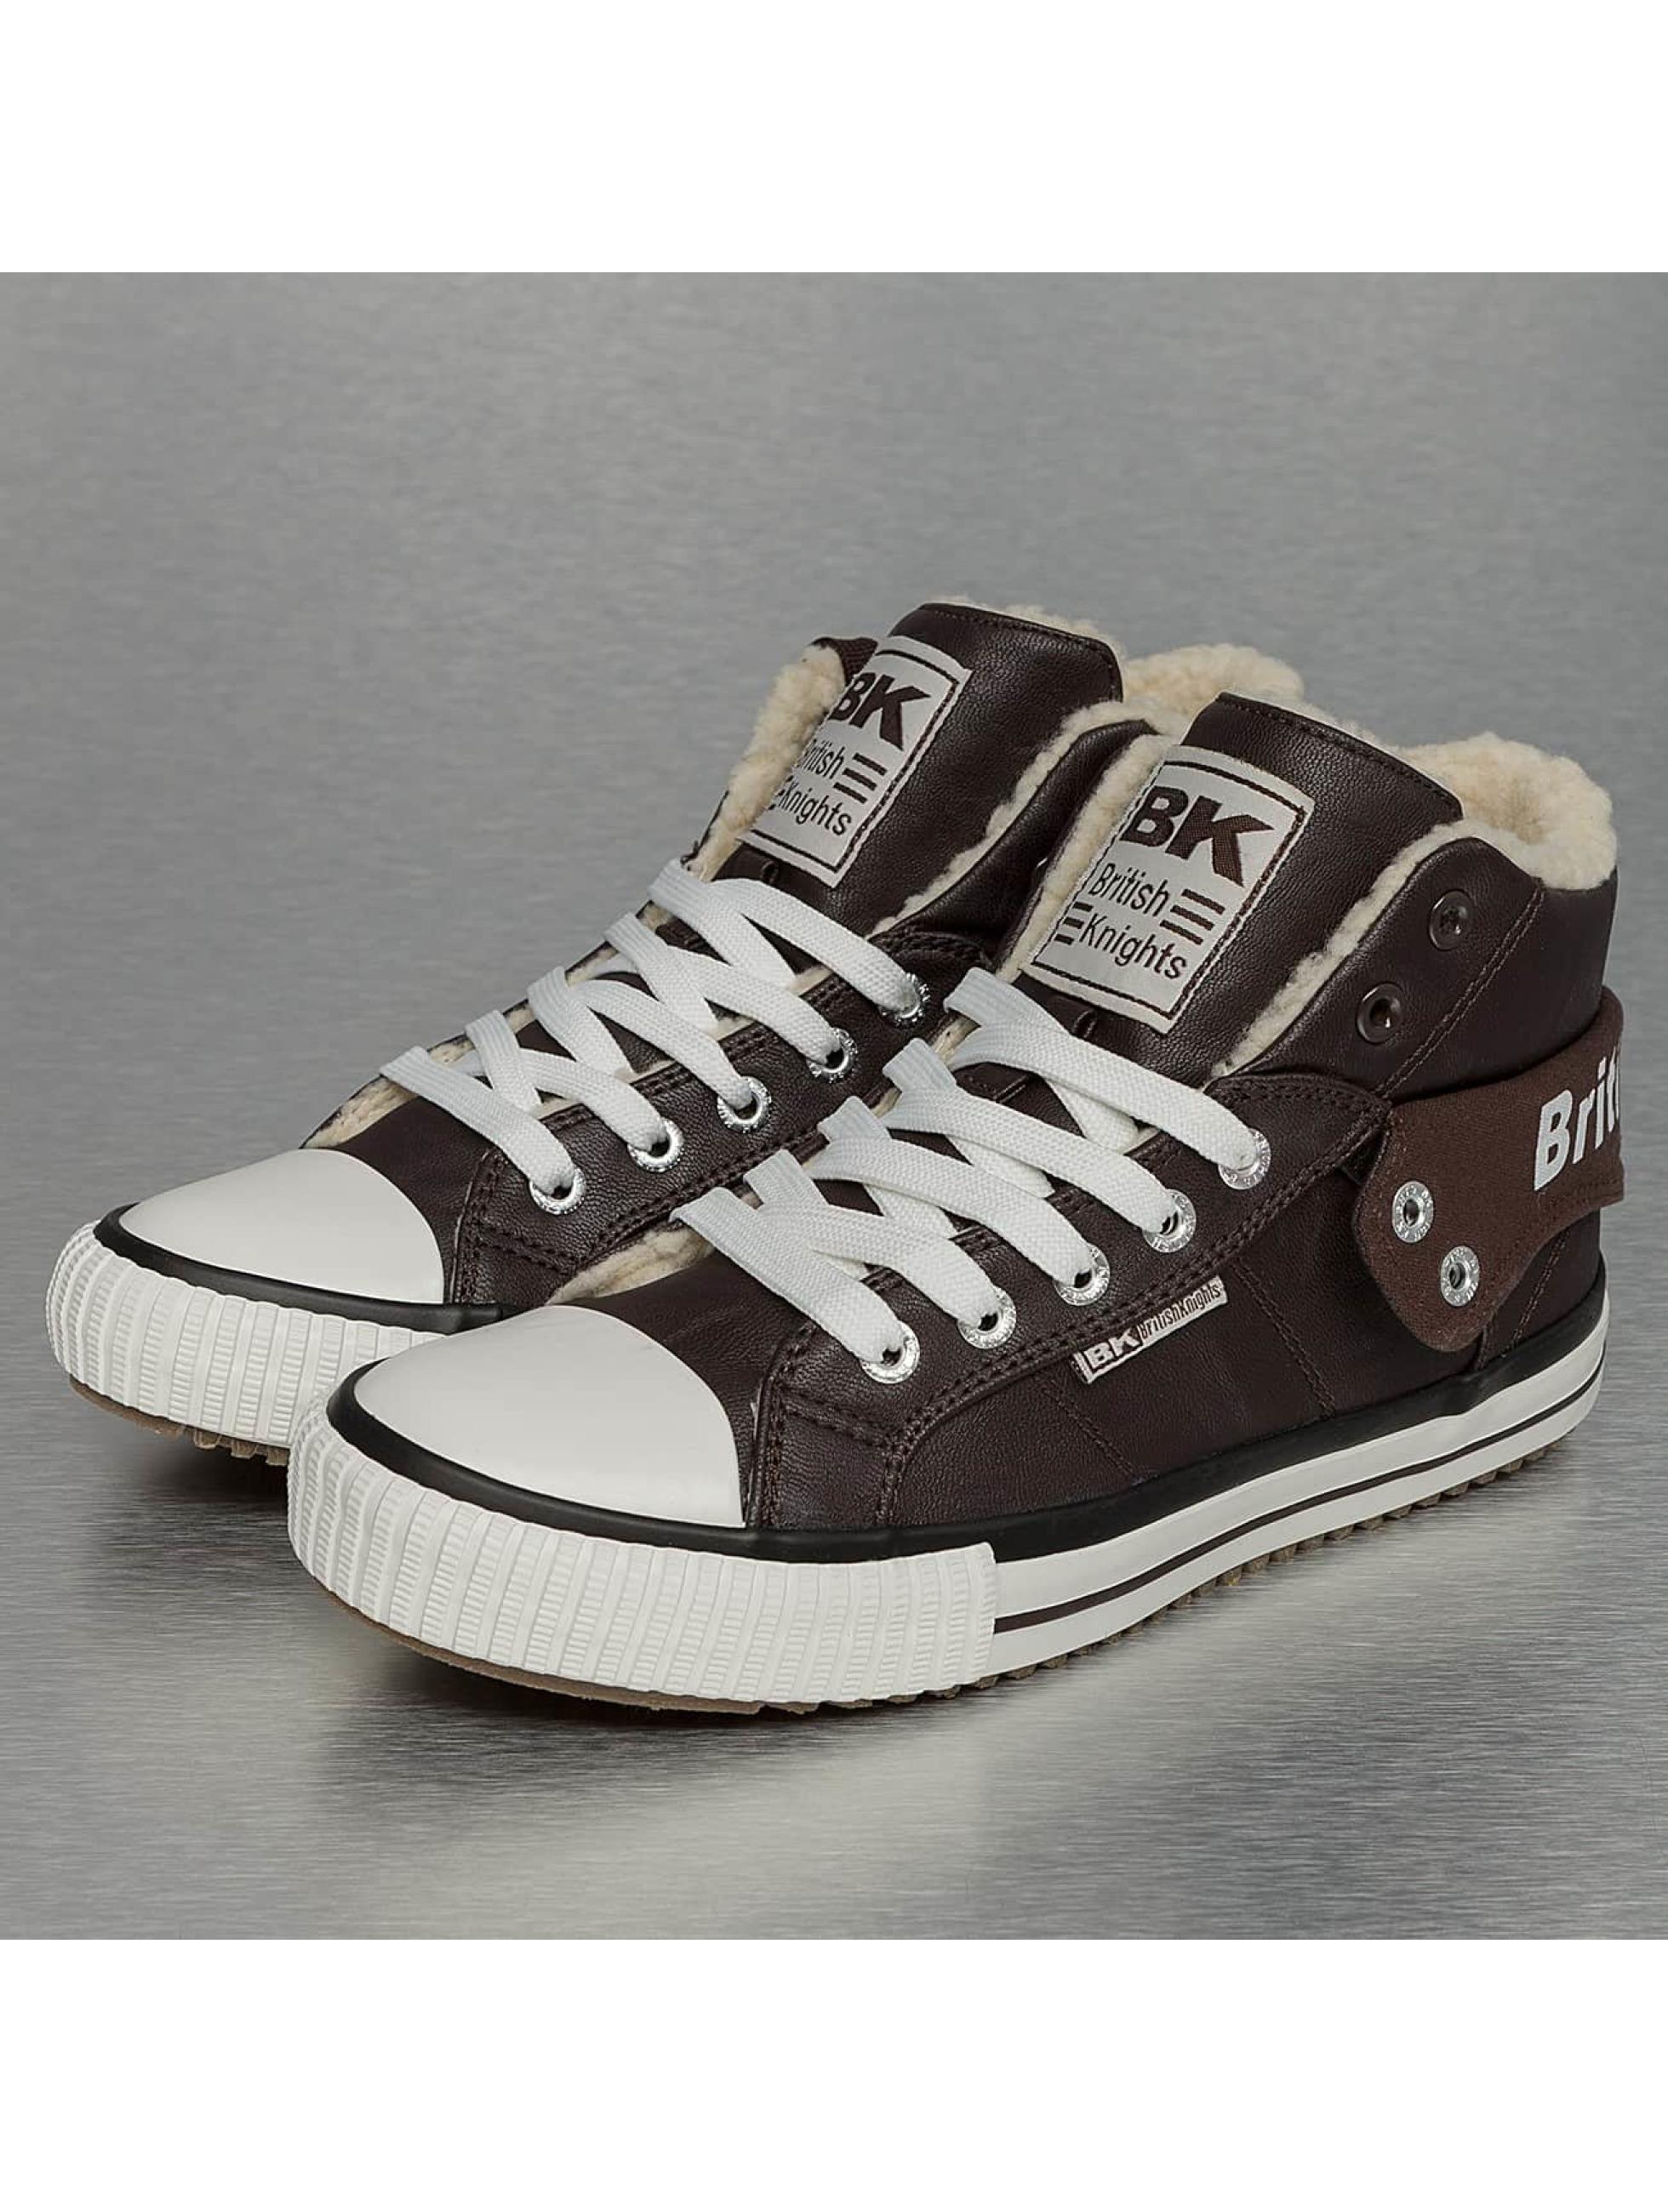 British Knights Sneakers Roco PU WL Profile hnedá